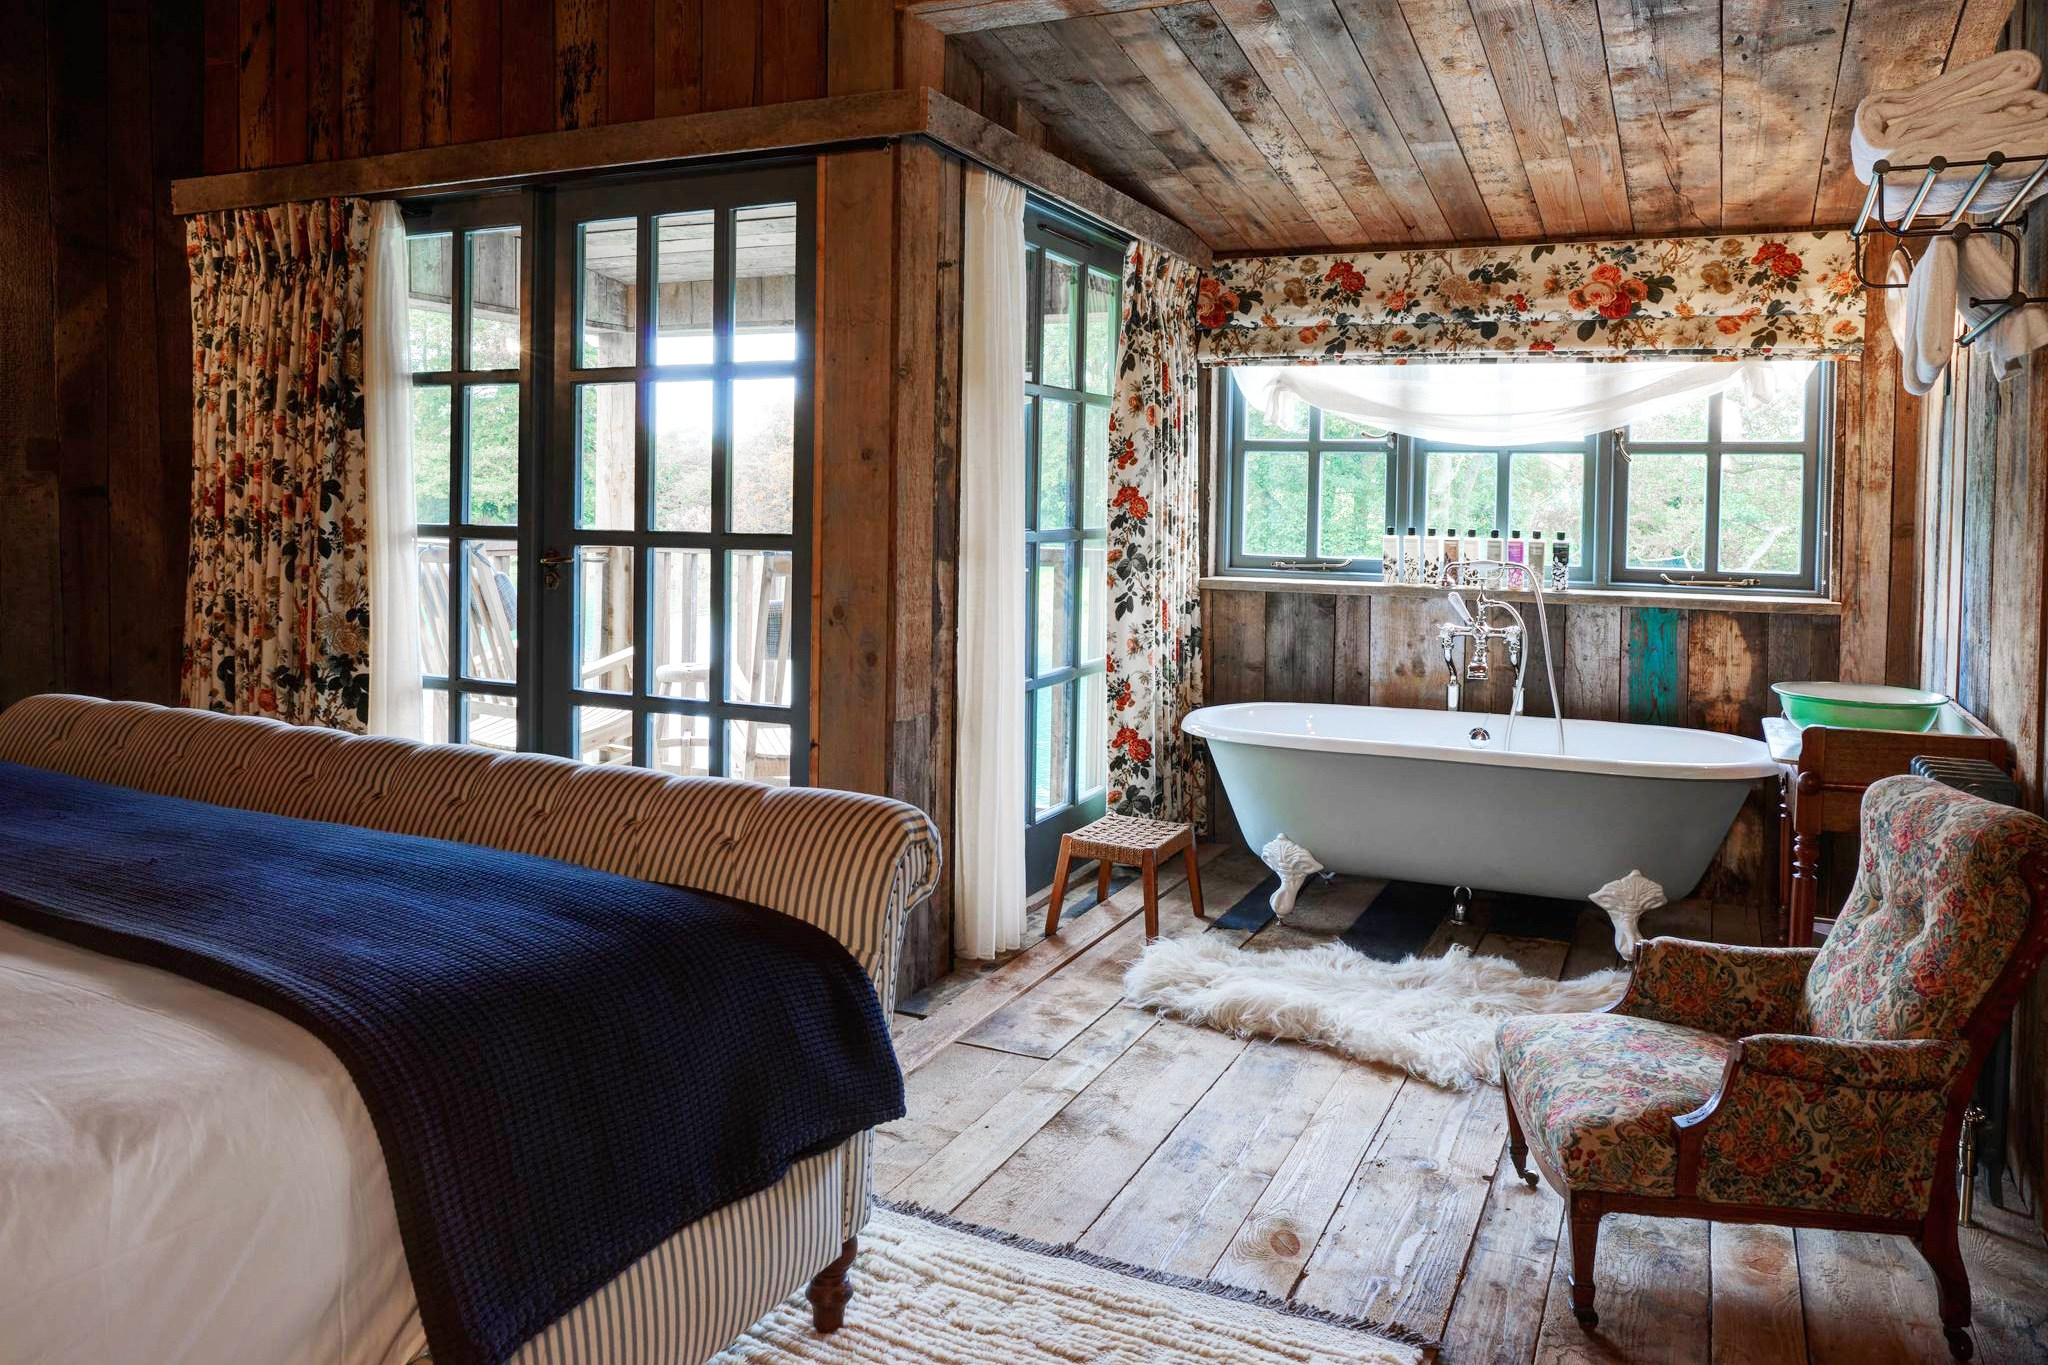 soho-house-farmhouse-2016-boyd-hotel-oxfordshire-6